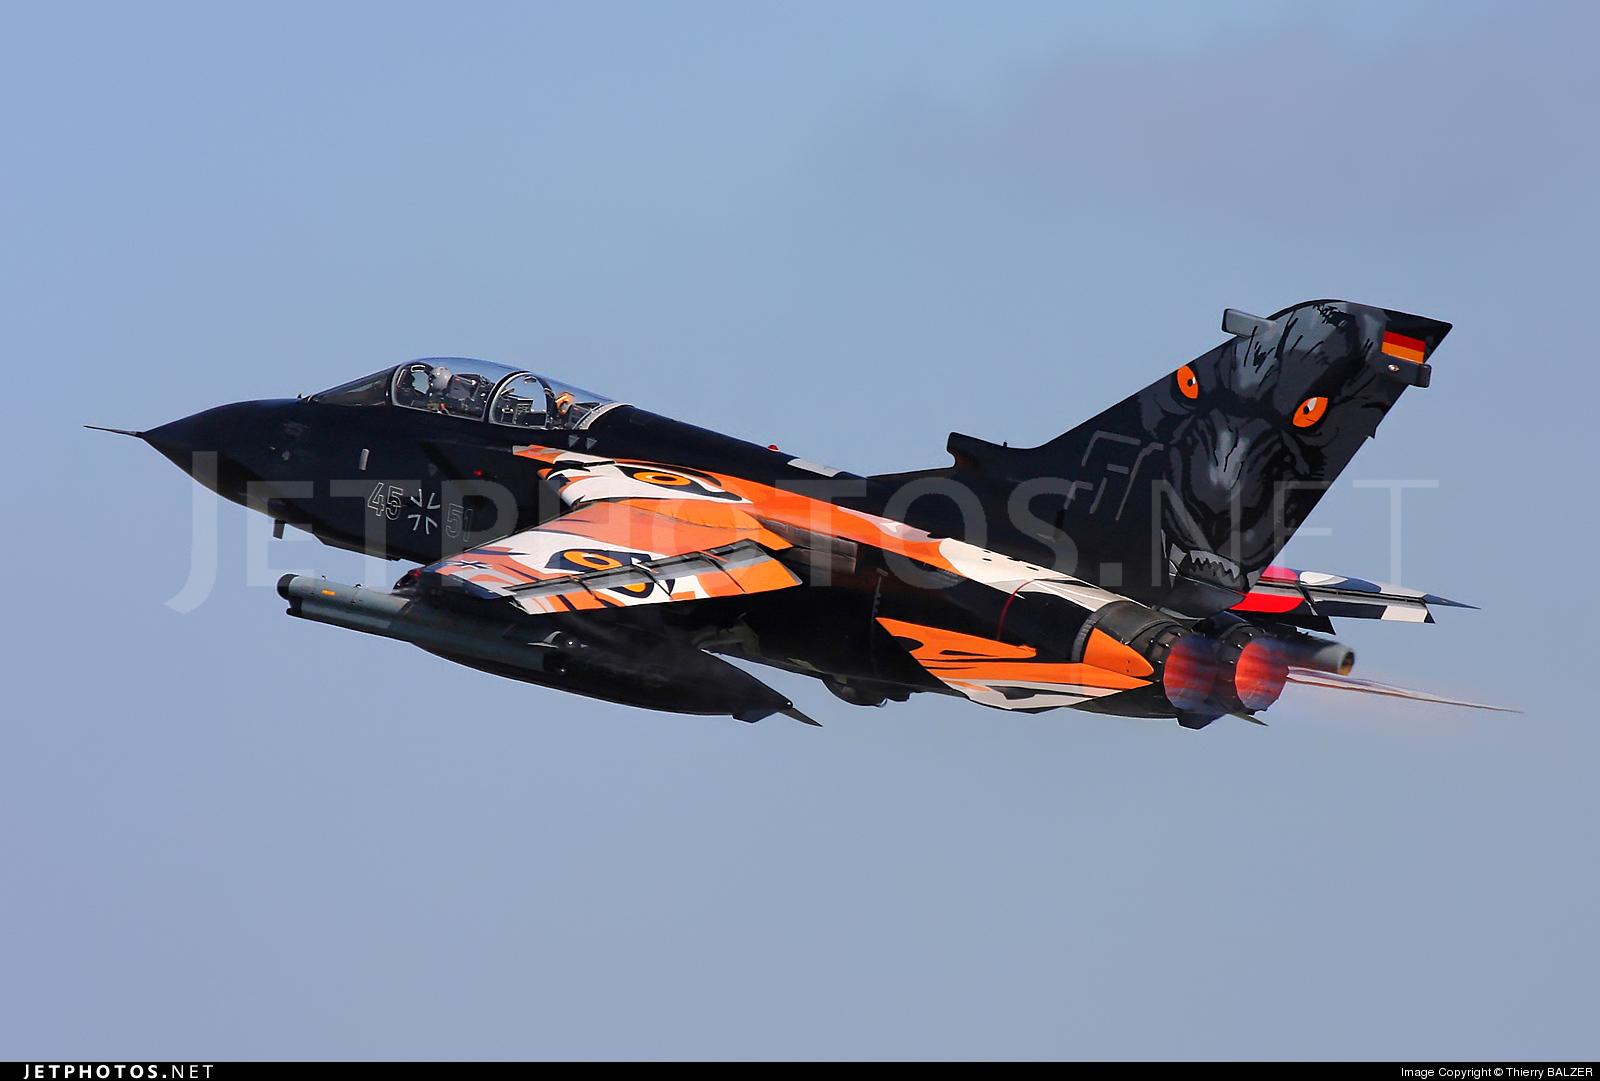 45-51 - Panavia Tornado IDS - Germany - Air Force